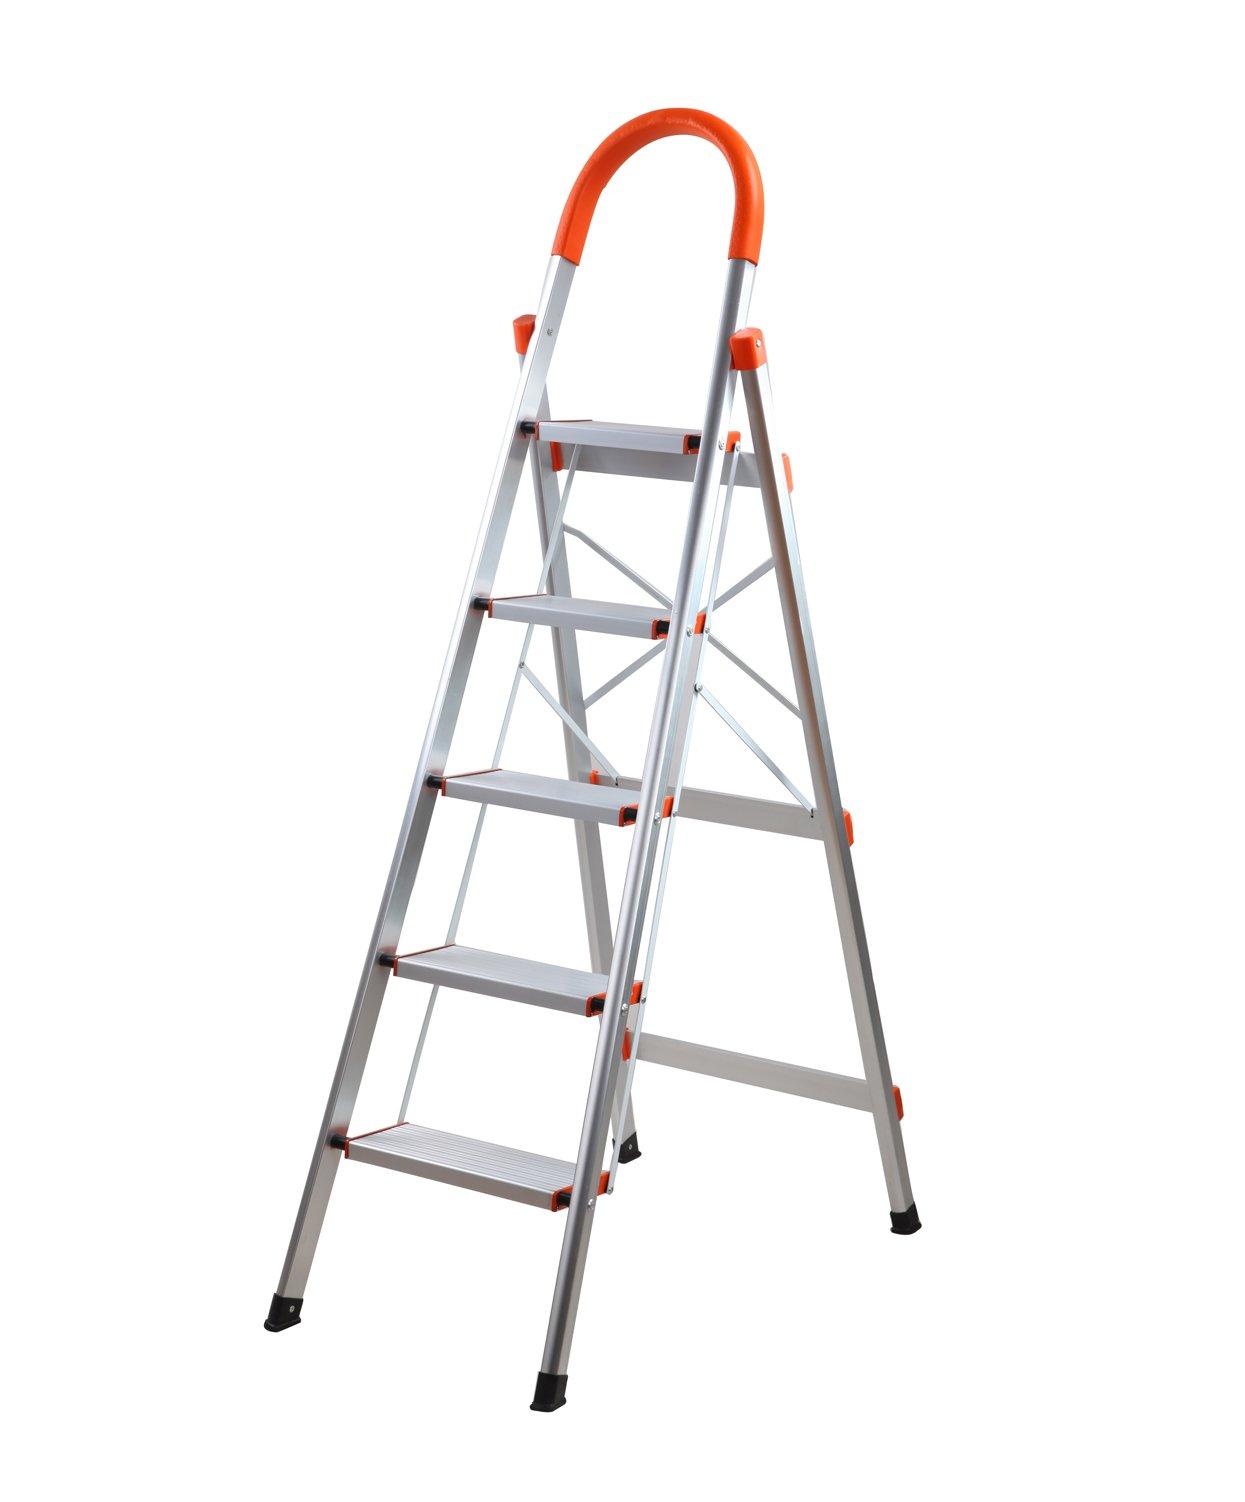 Aluminum Step Ladder Lightweight Multi Purpose Portable Folding Home Ladder 5 Step